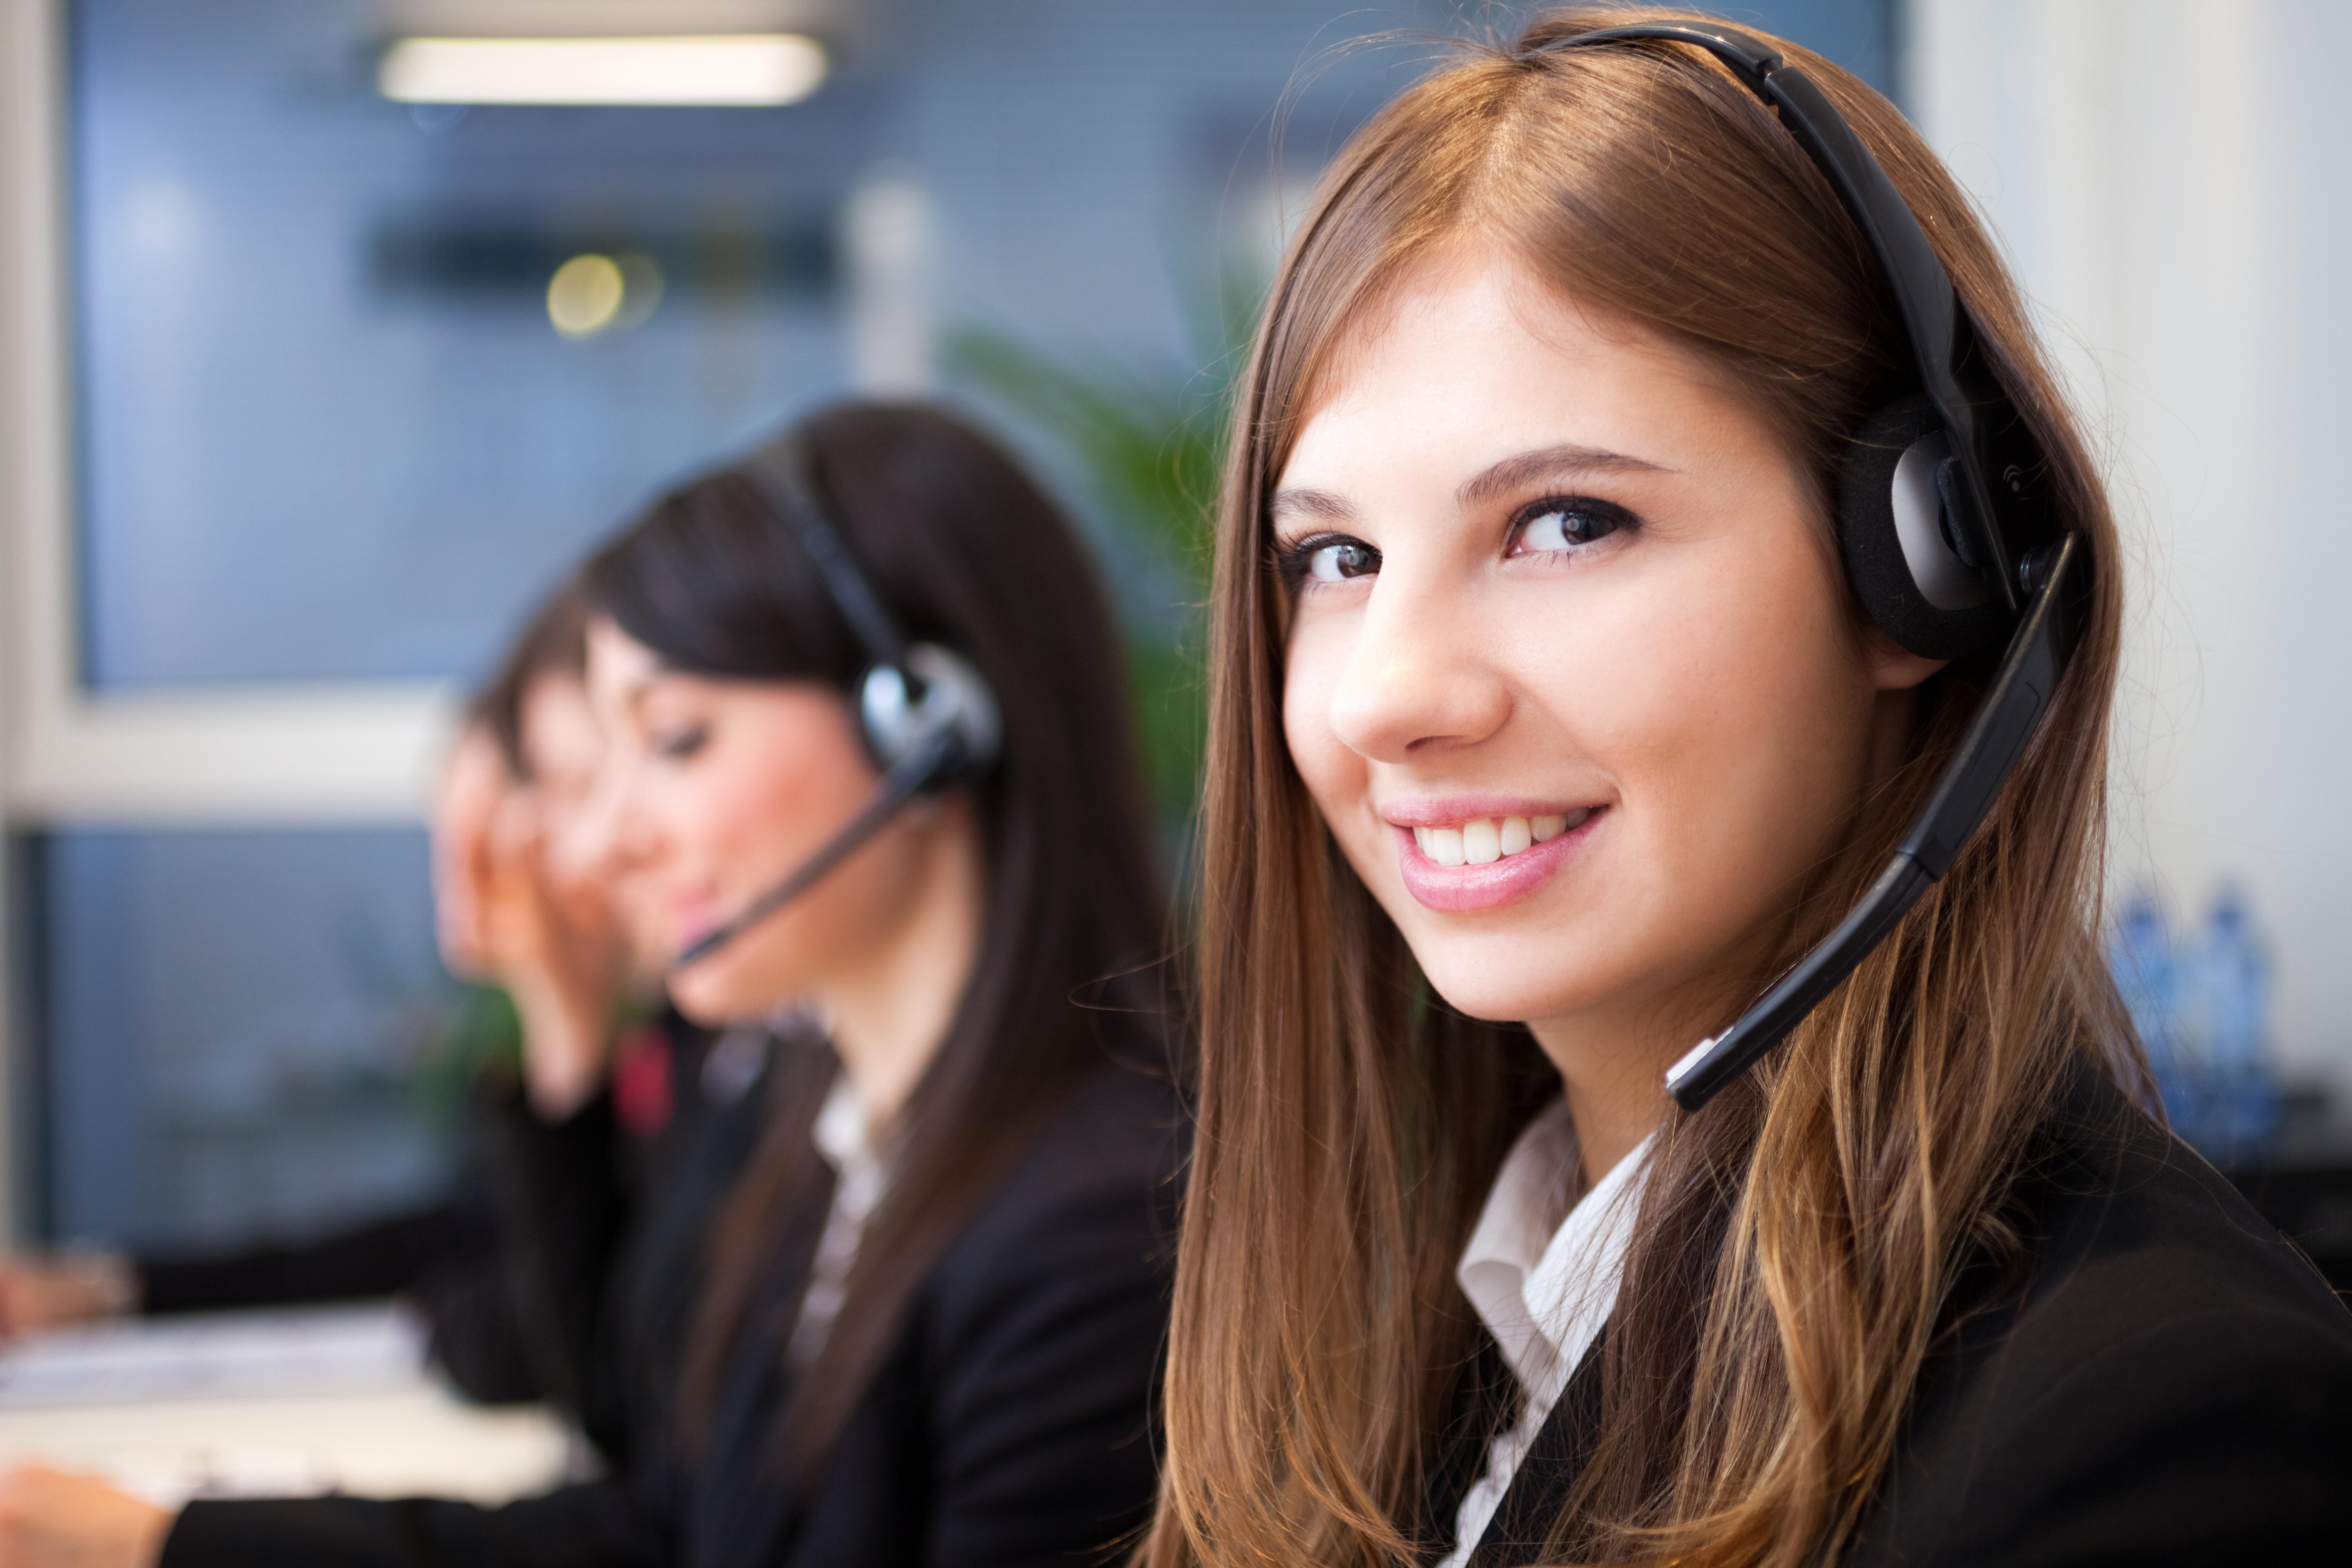 Call girl at work 9